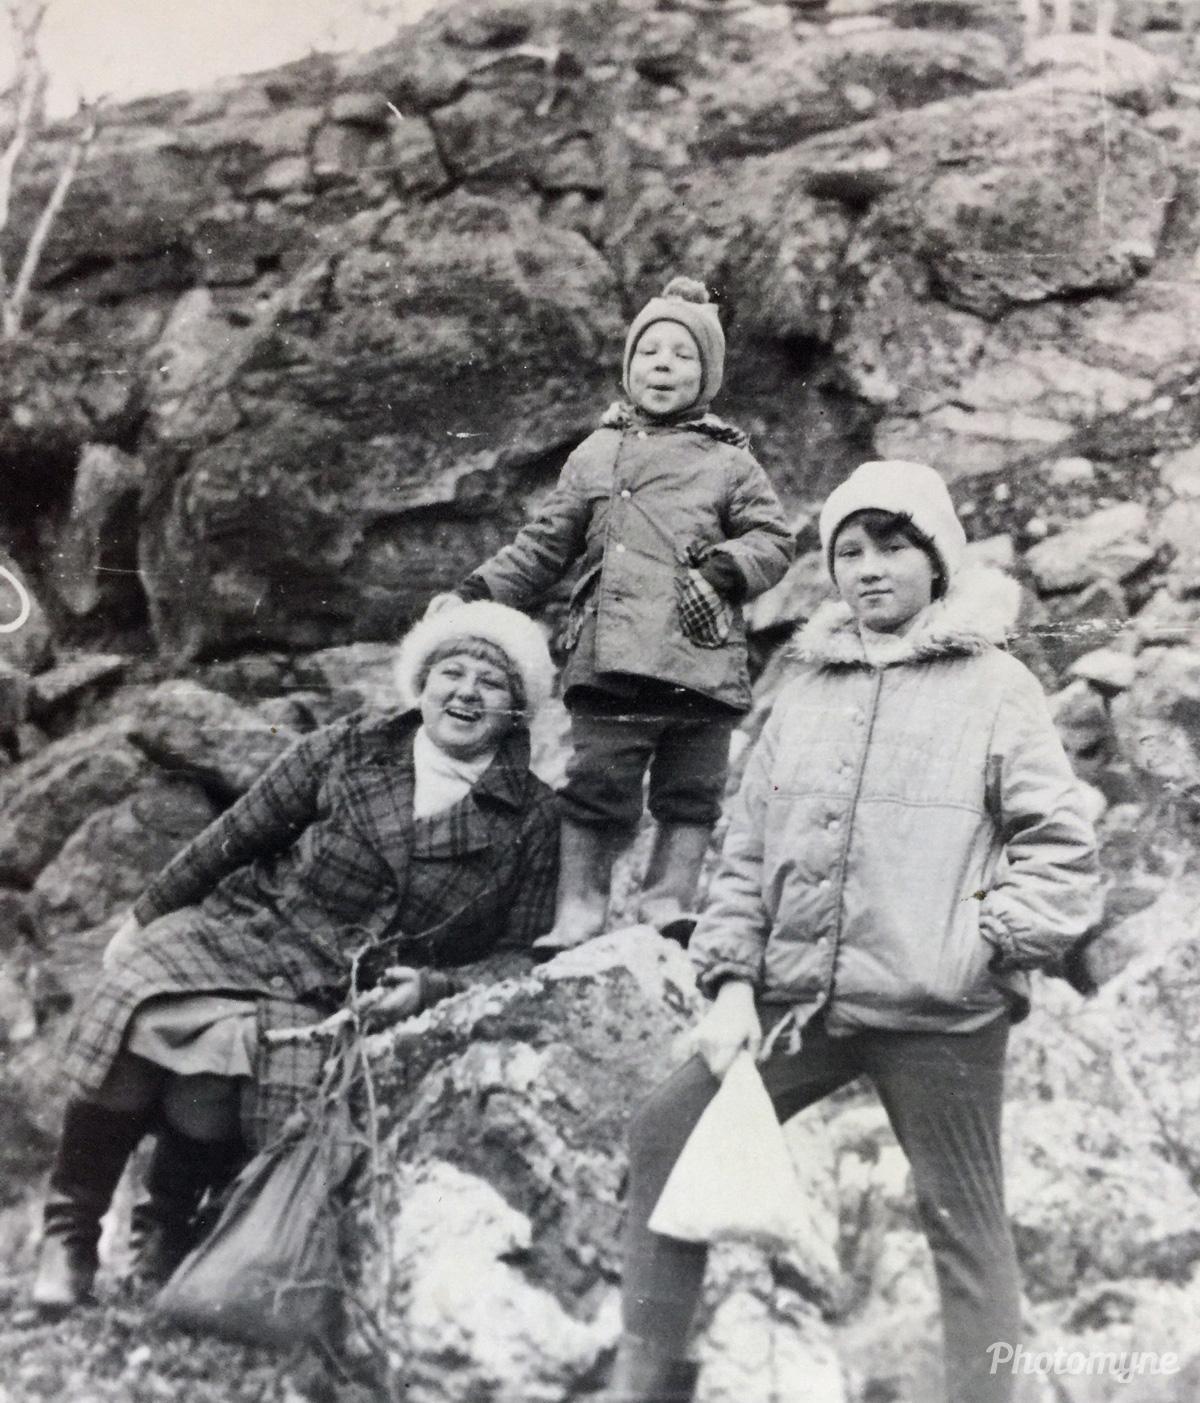 Прогулка!))) (Stroll!))), Murmansk, Russia, 1985